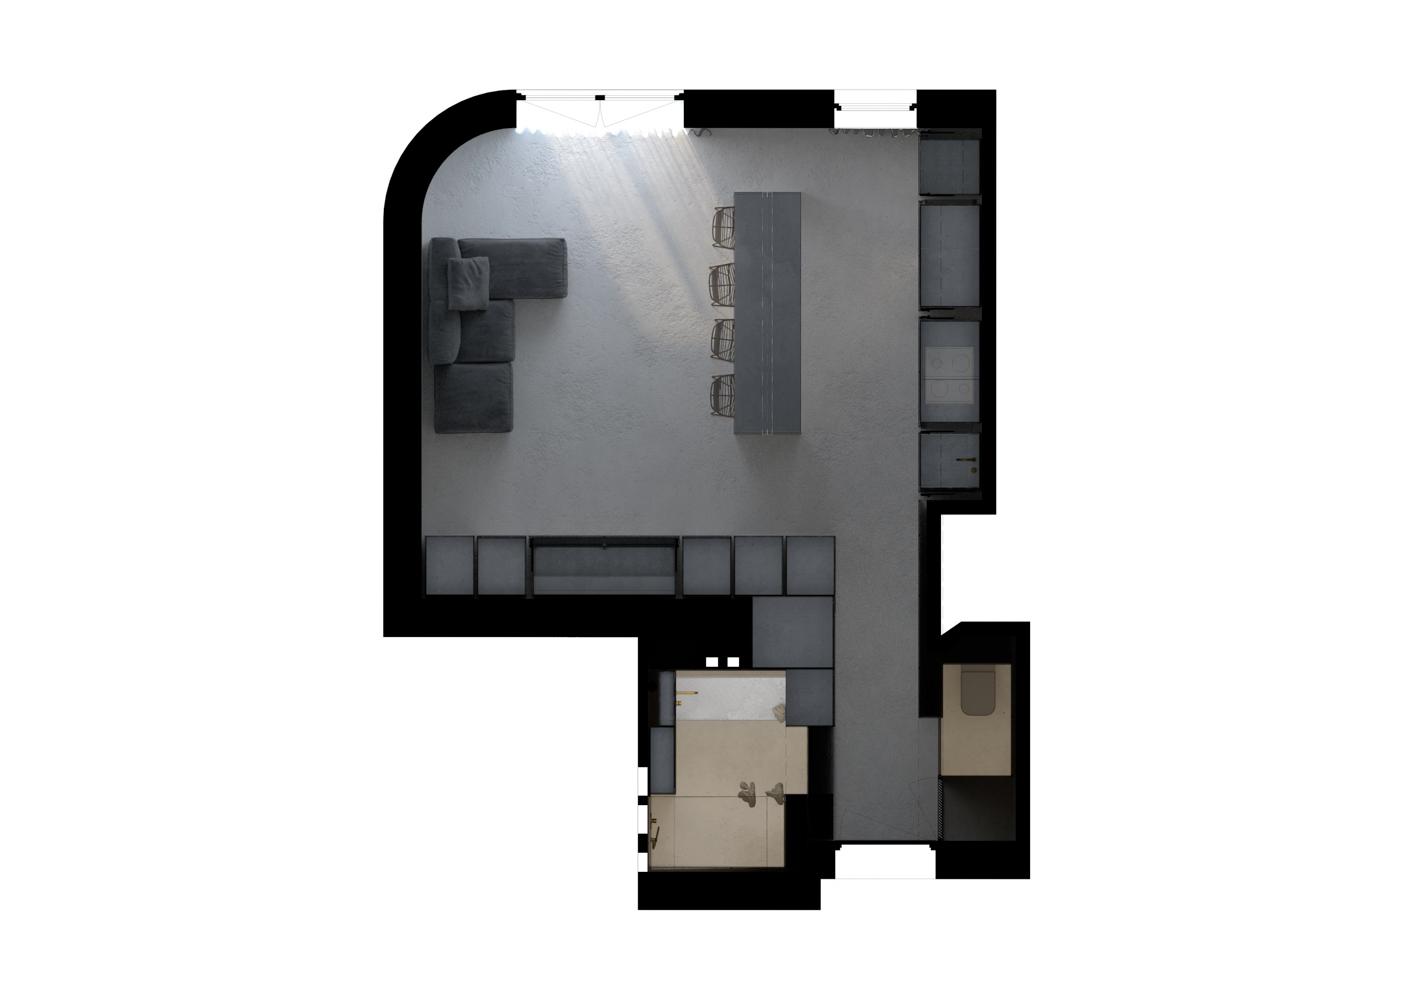 zero-room-apartment-mas-the-design-emotive-18.jpg